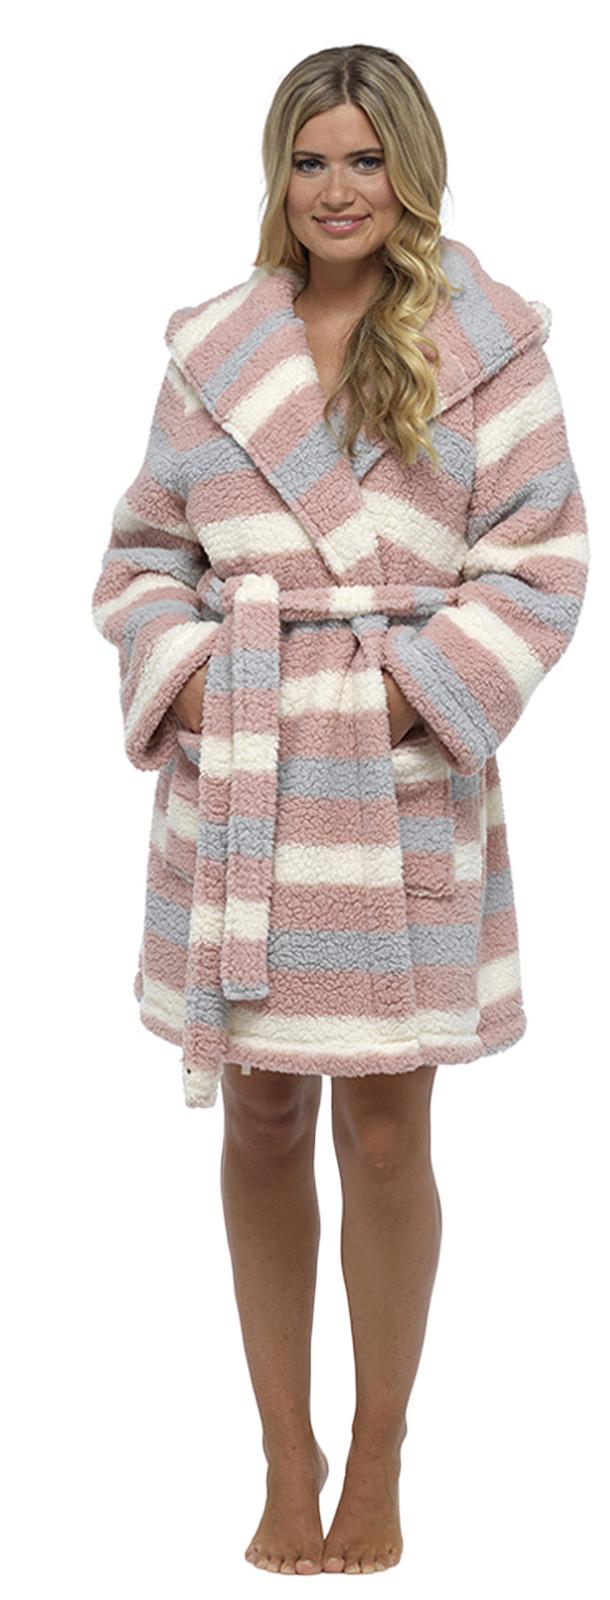 Womens Hooded Sherpa Soft Snuggle Dressing Gown Short Bath Robe ... 1846323b4